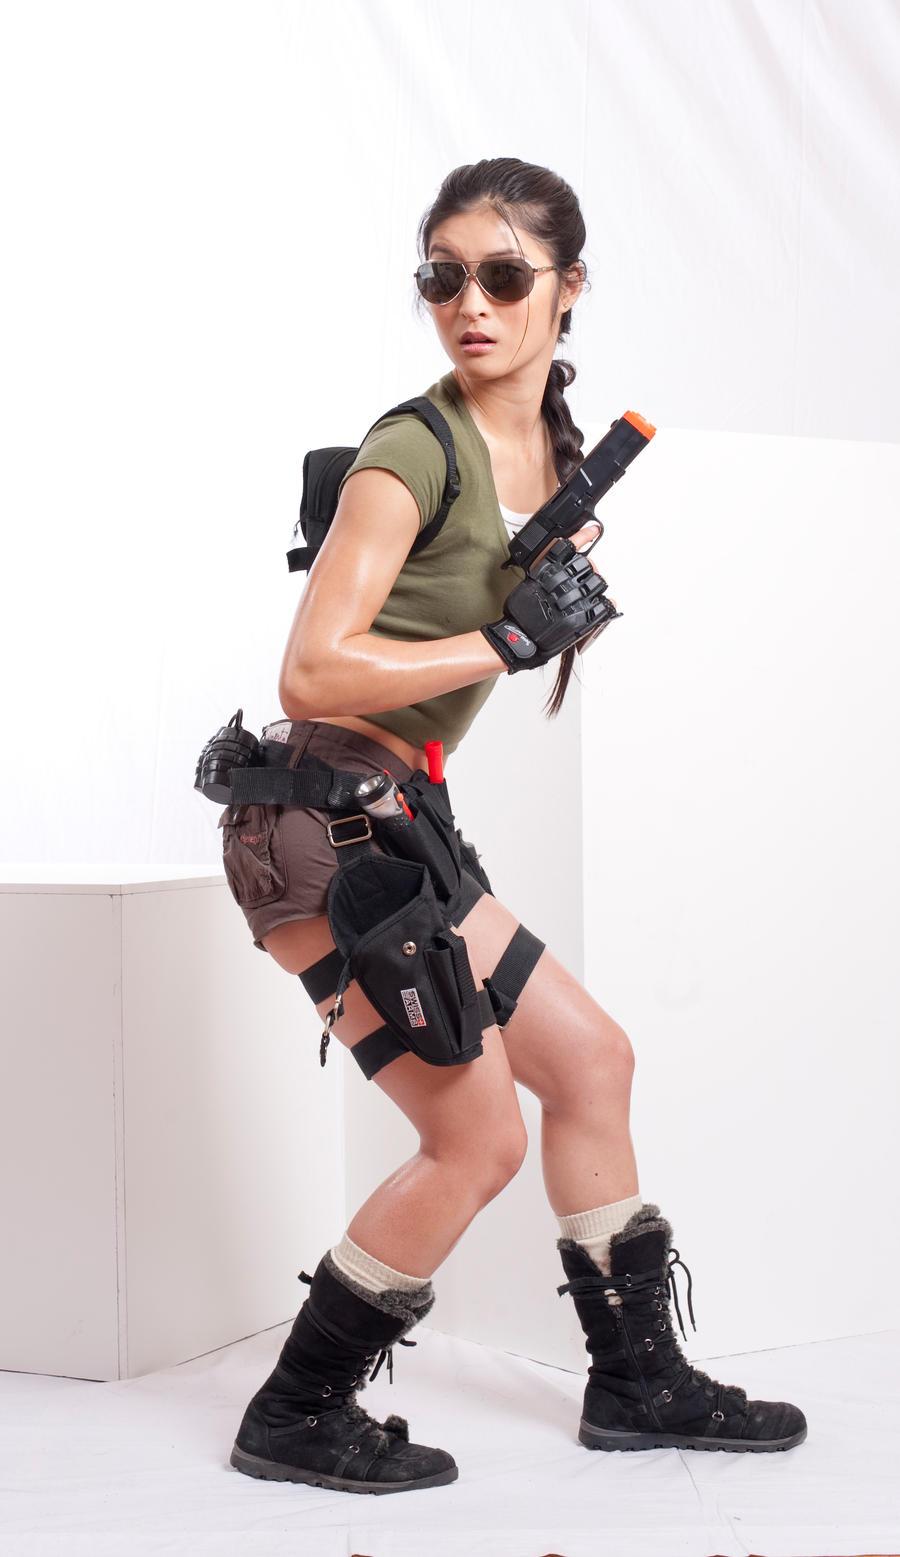 Kimberly Raider 2a